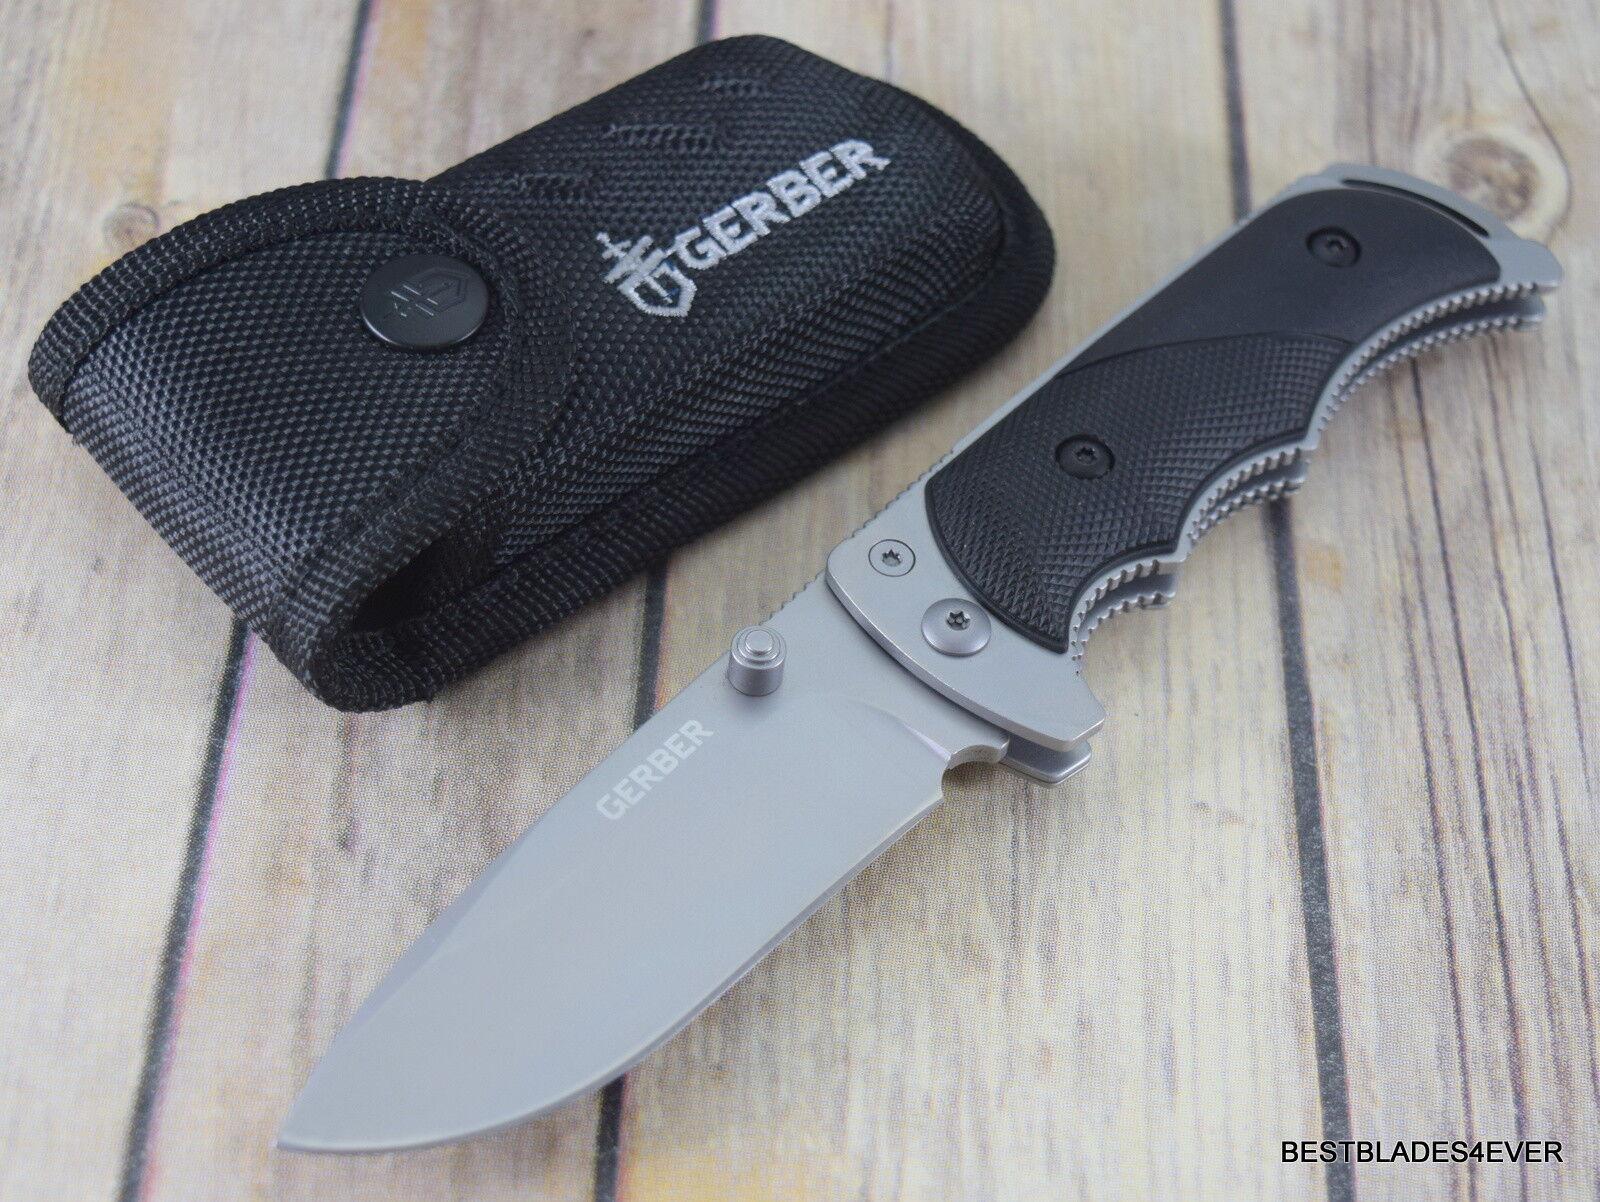 8.1 INCH GERBER FREEMAN GUIDE FOLDING POCKET KNIFE WITH NYLON SHEATH